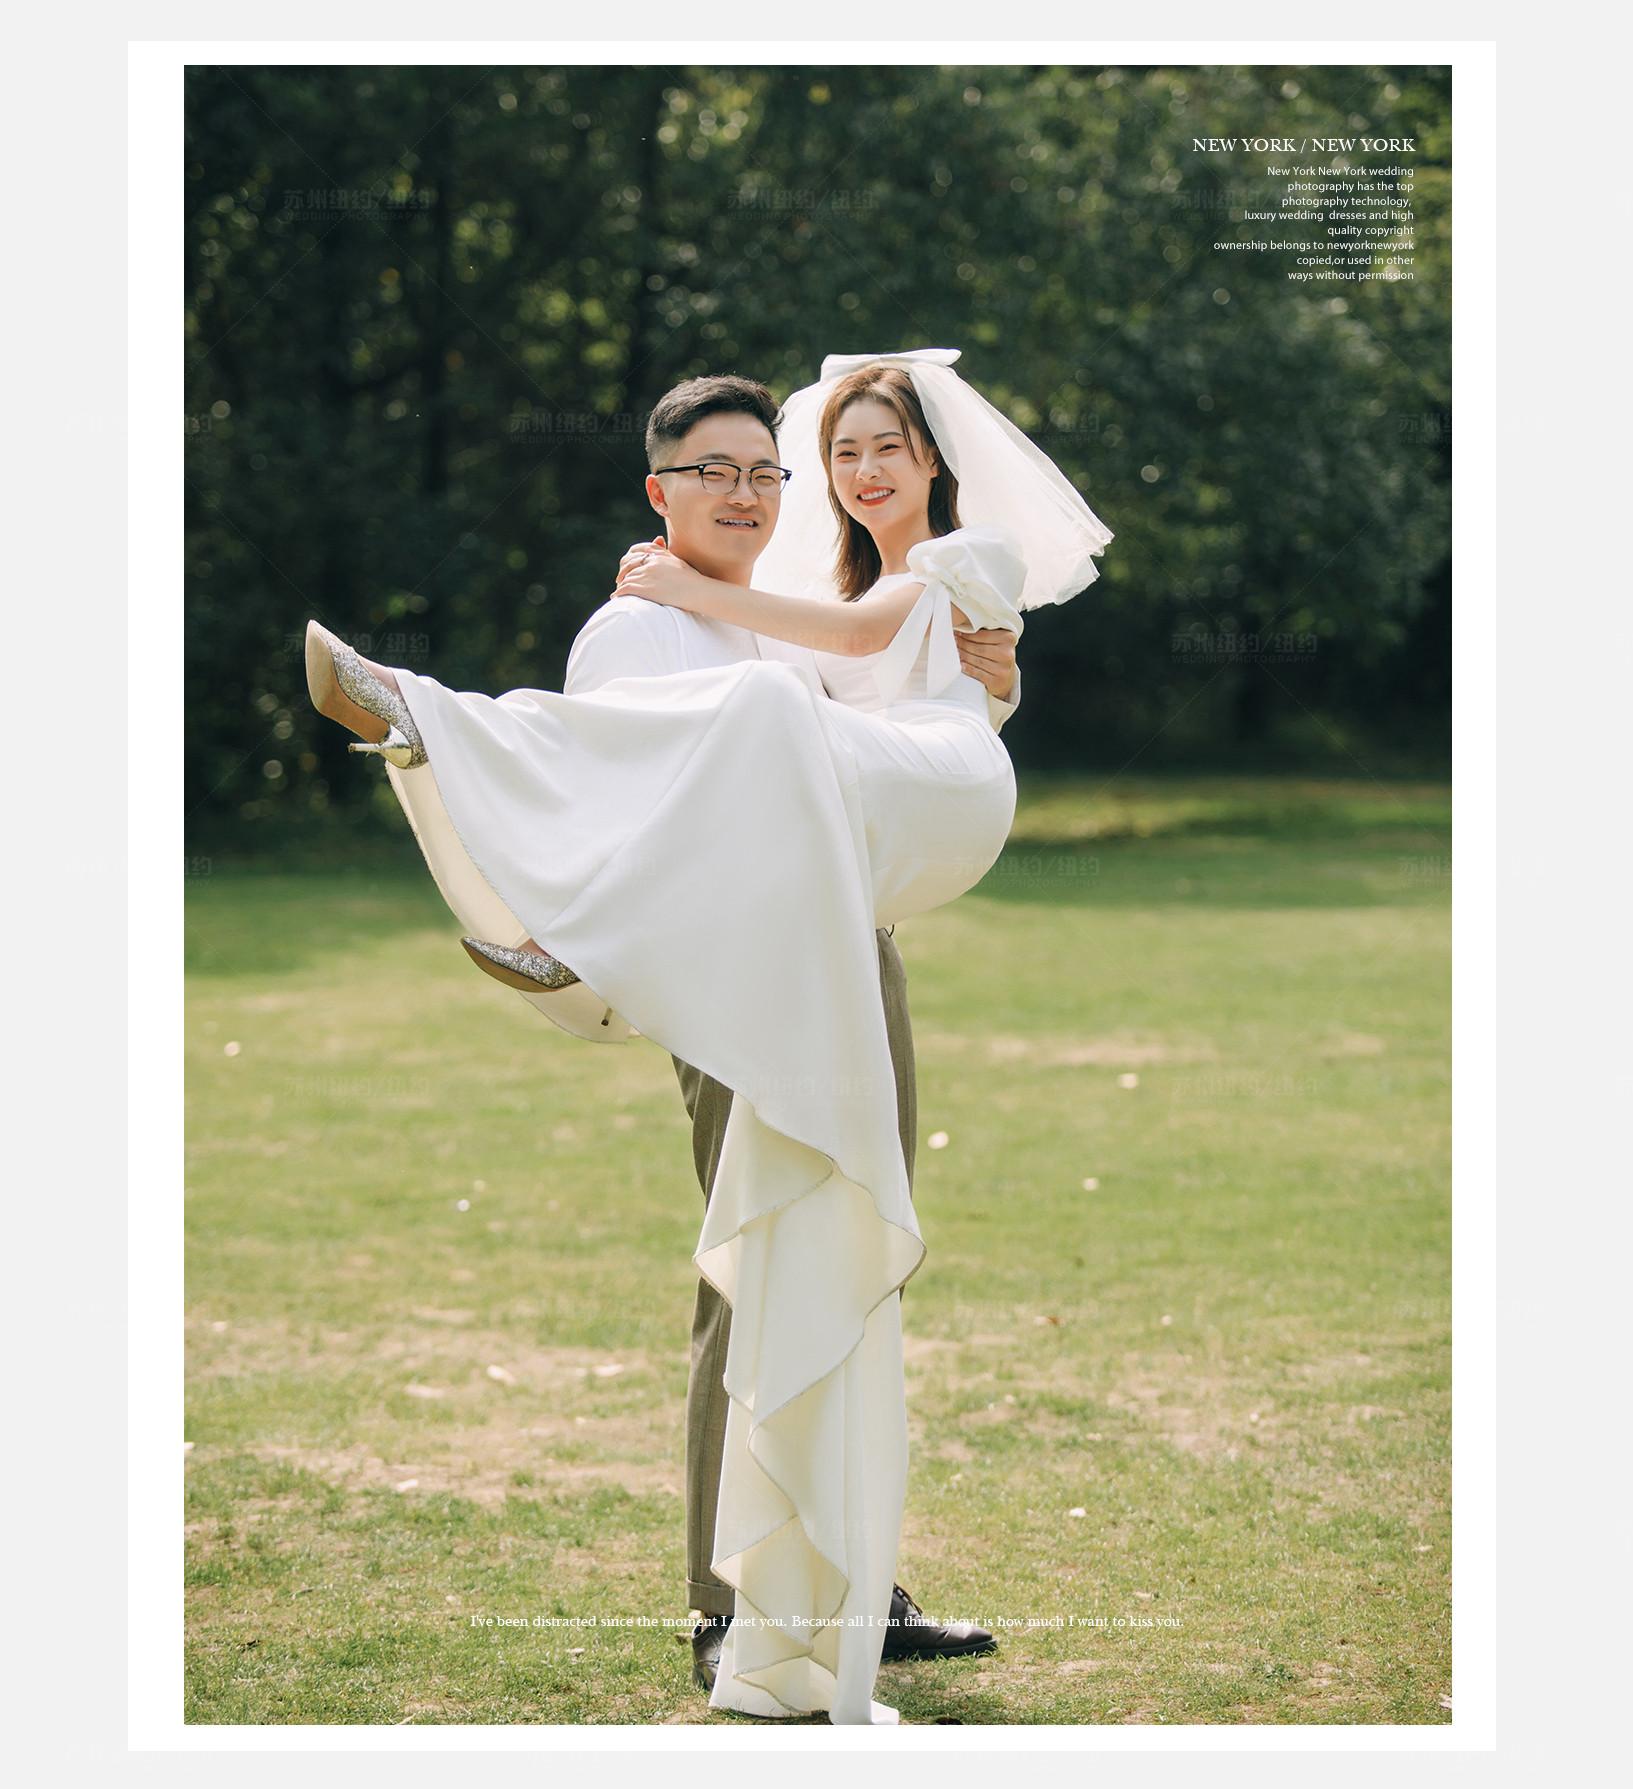 Mr.施 & Ms.邢(纽约纽约最新客照)婚纱摄影照